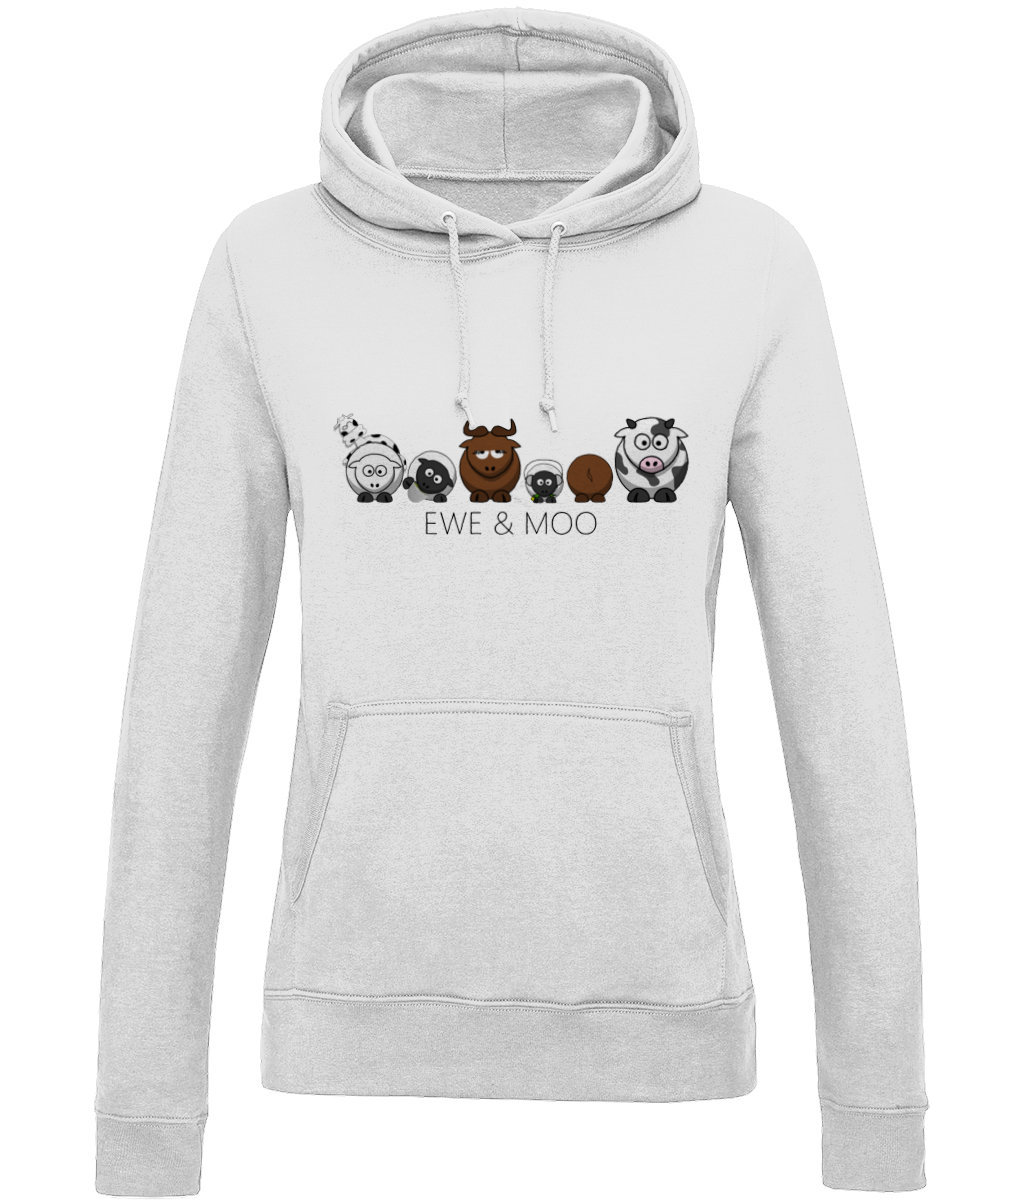 "Womens Hoodie ""EWE&MOO"", Hoodie, Jumper, Cardigan, Cow Hoodie, Animal Hoodie, Sheep Hoodie, Cotton Hoodie http://tuppu.net/65222c84 #Clothing #giftsforchildren #Handmadefurniture #lakedistrict #london #gifts #giftideas #sheep #Phonecases #PullOver pic.twitter.com/NdJvFyDaZe"